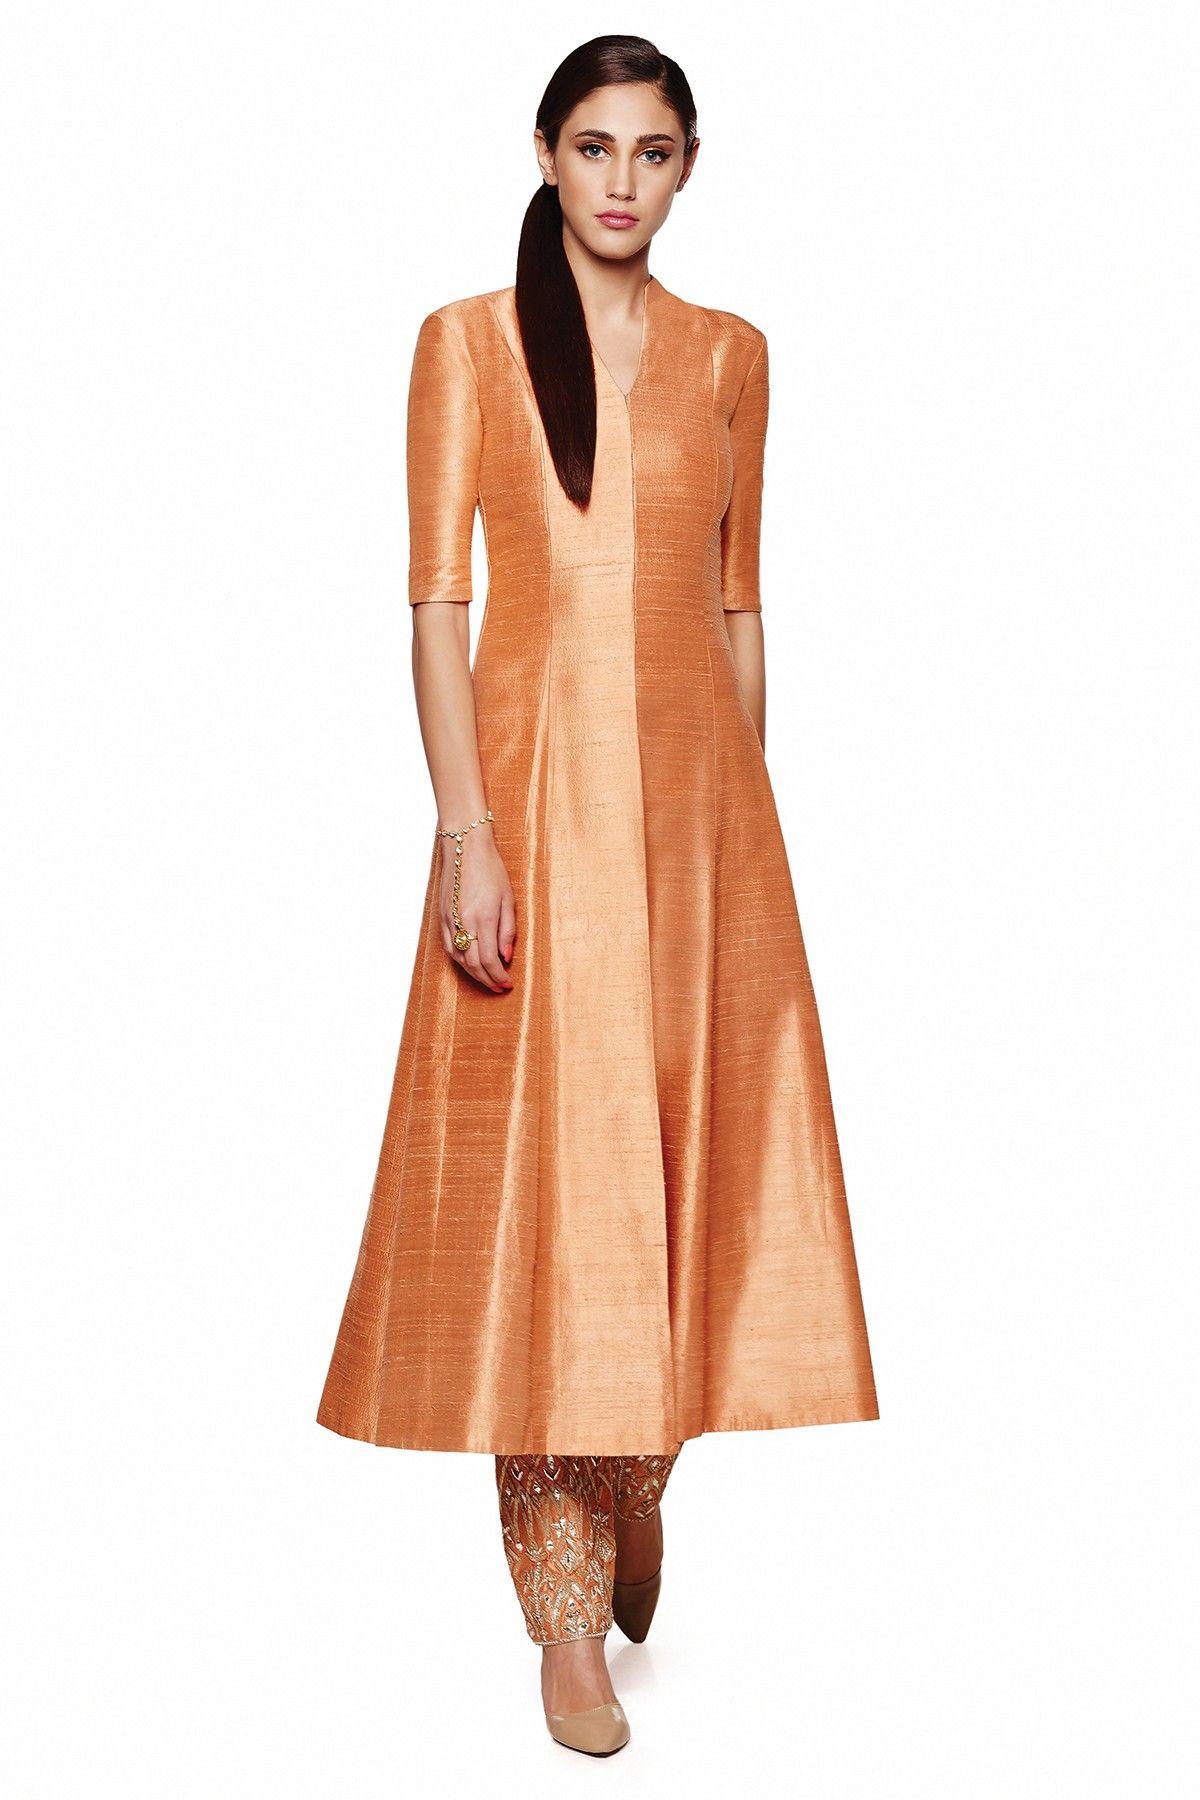 b71e4e834af coral orange jacket kurta in raw silk with pajami